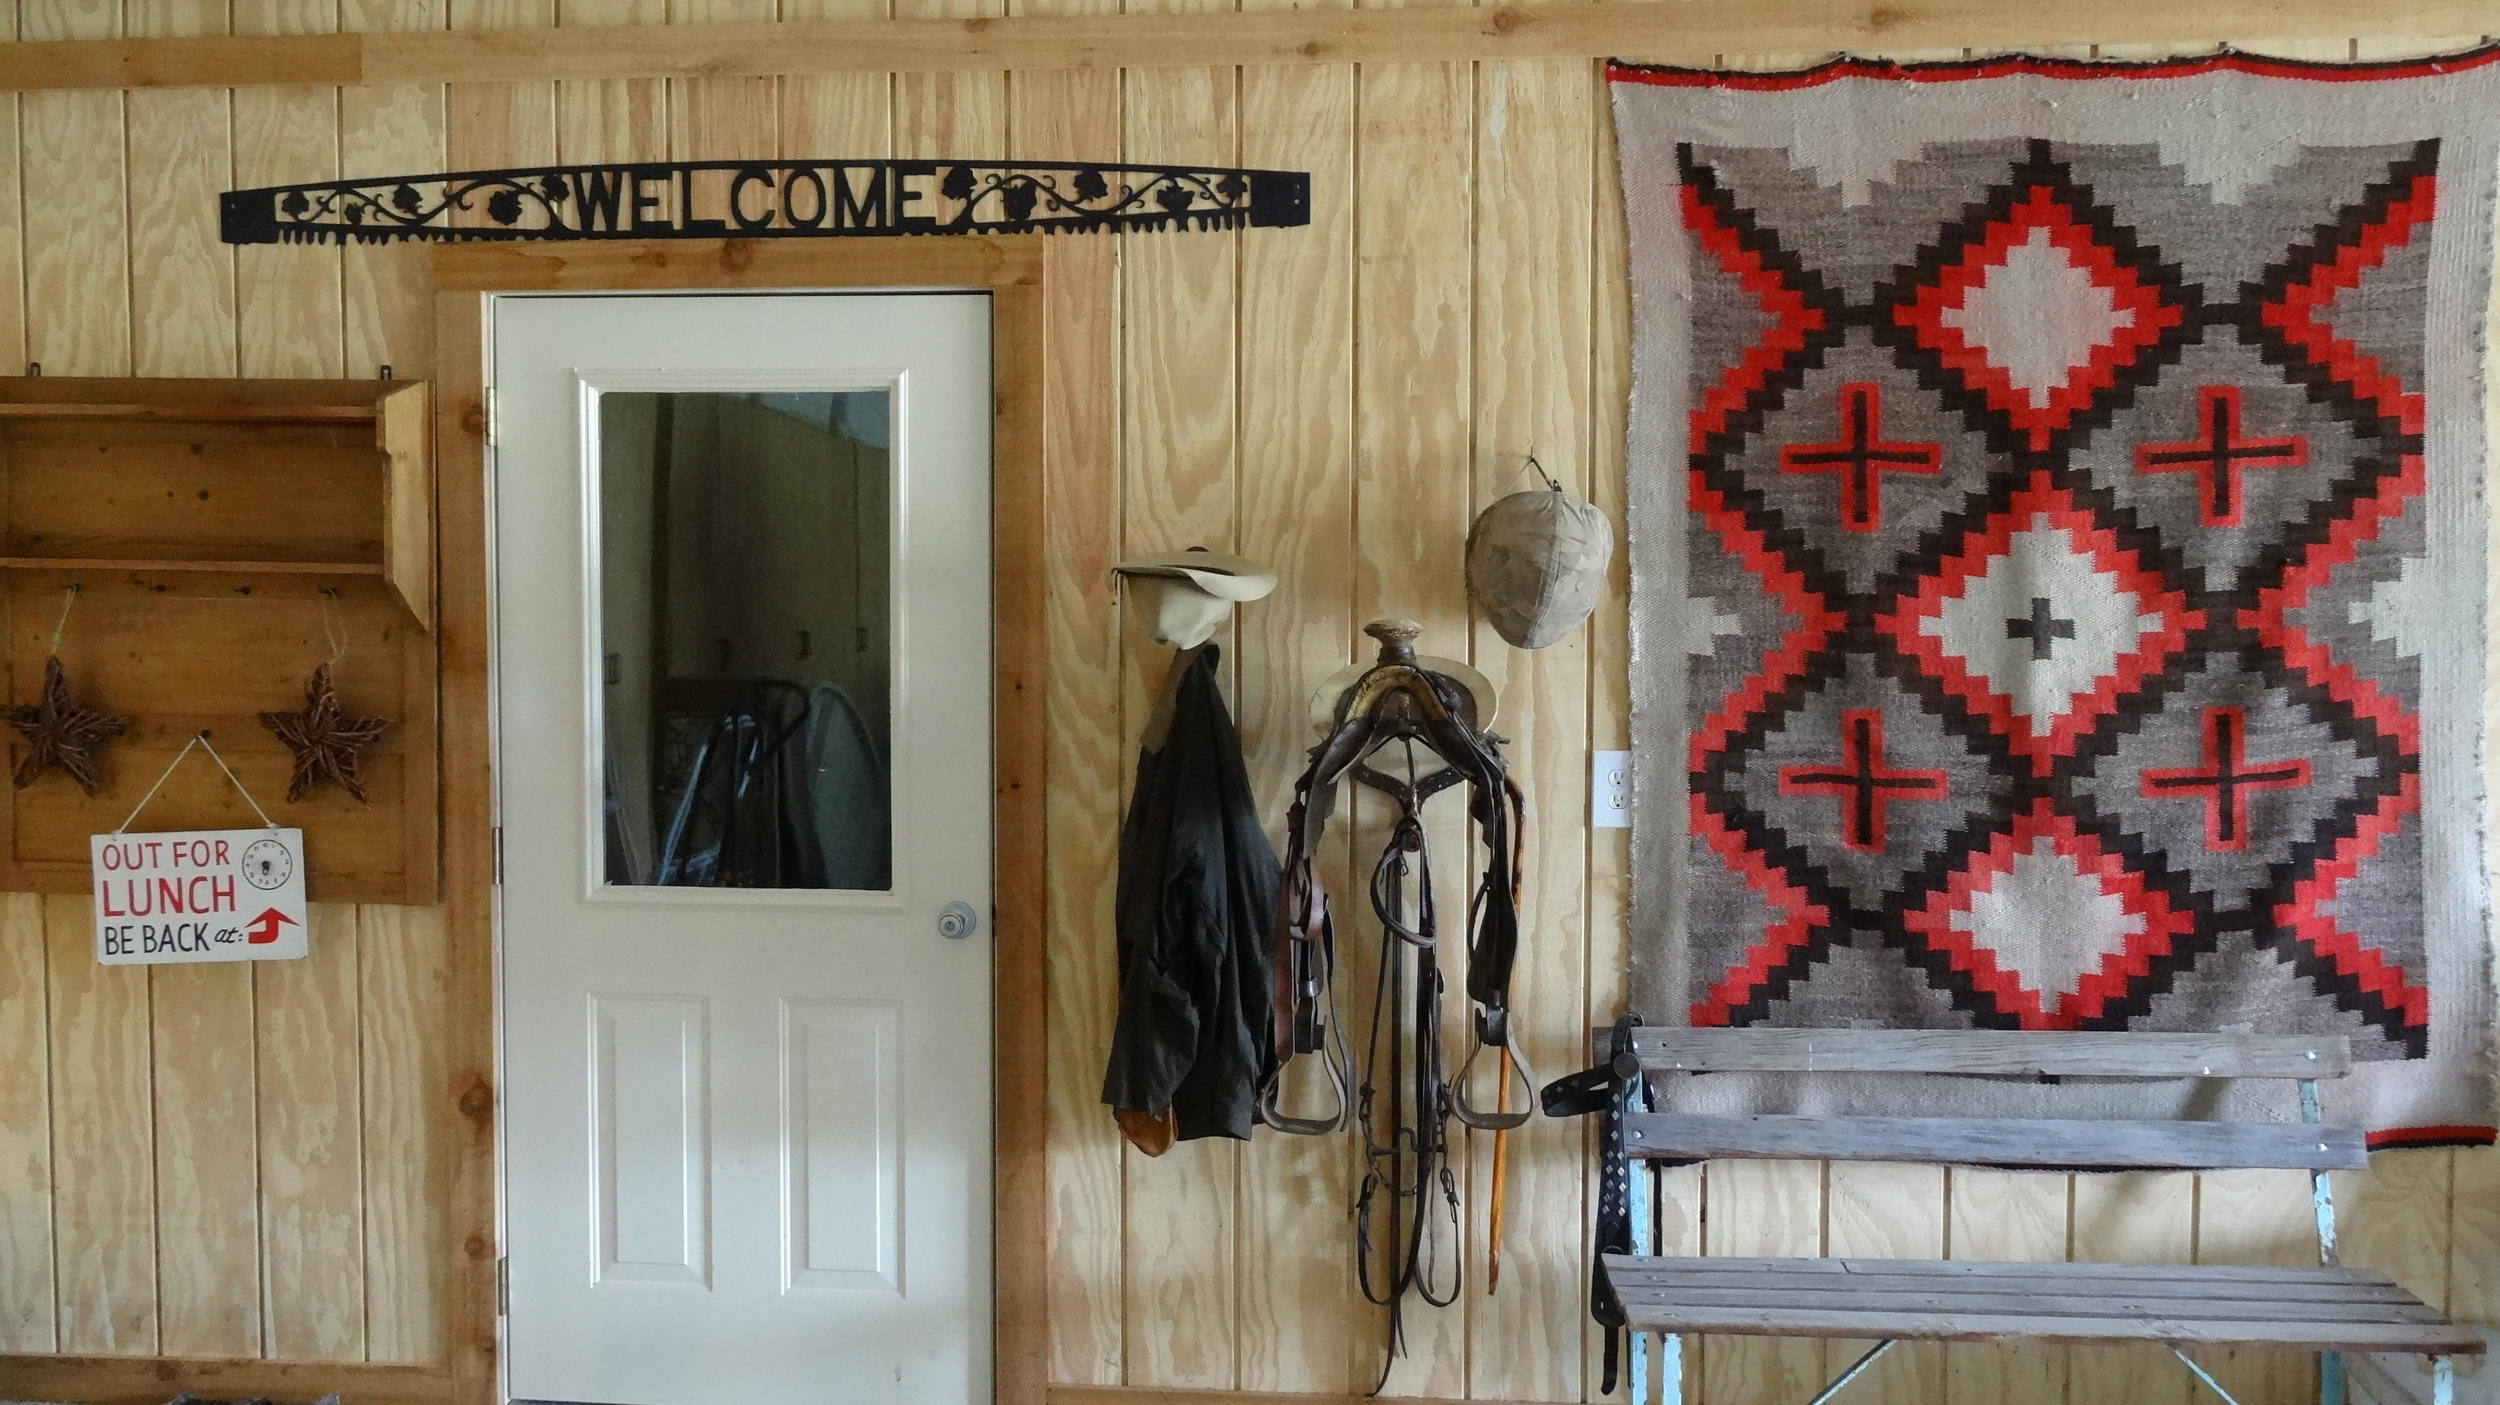 More photos of The Bunkhouse